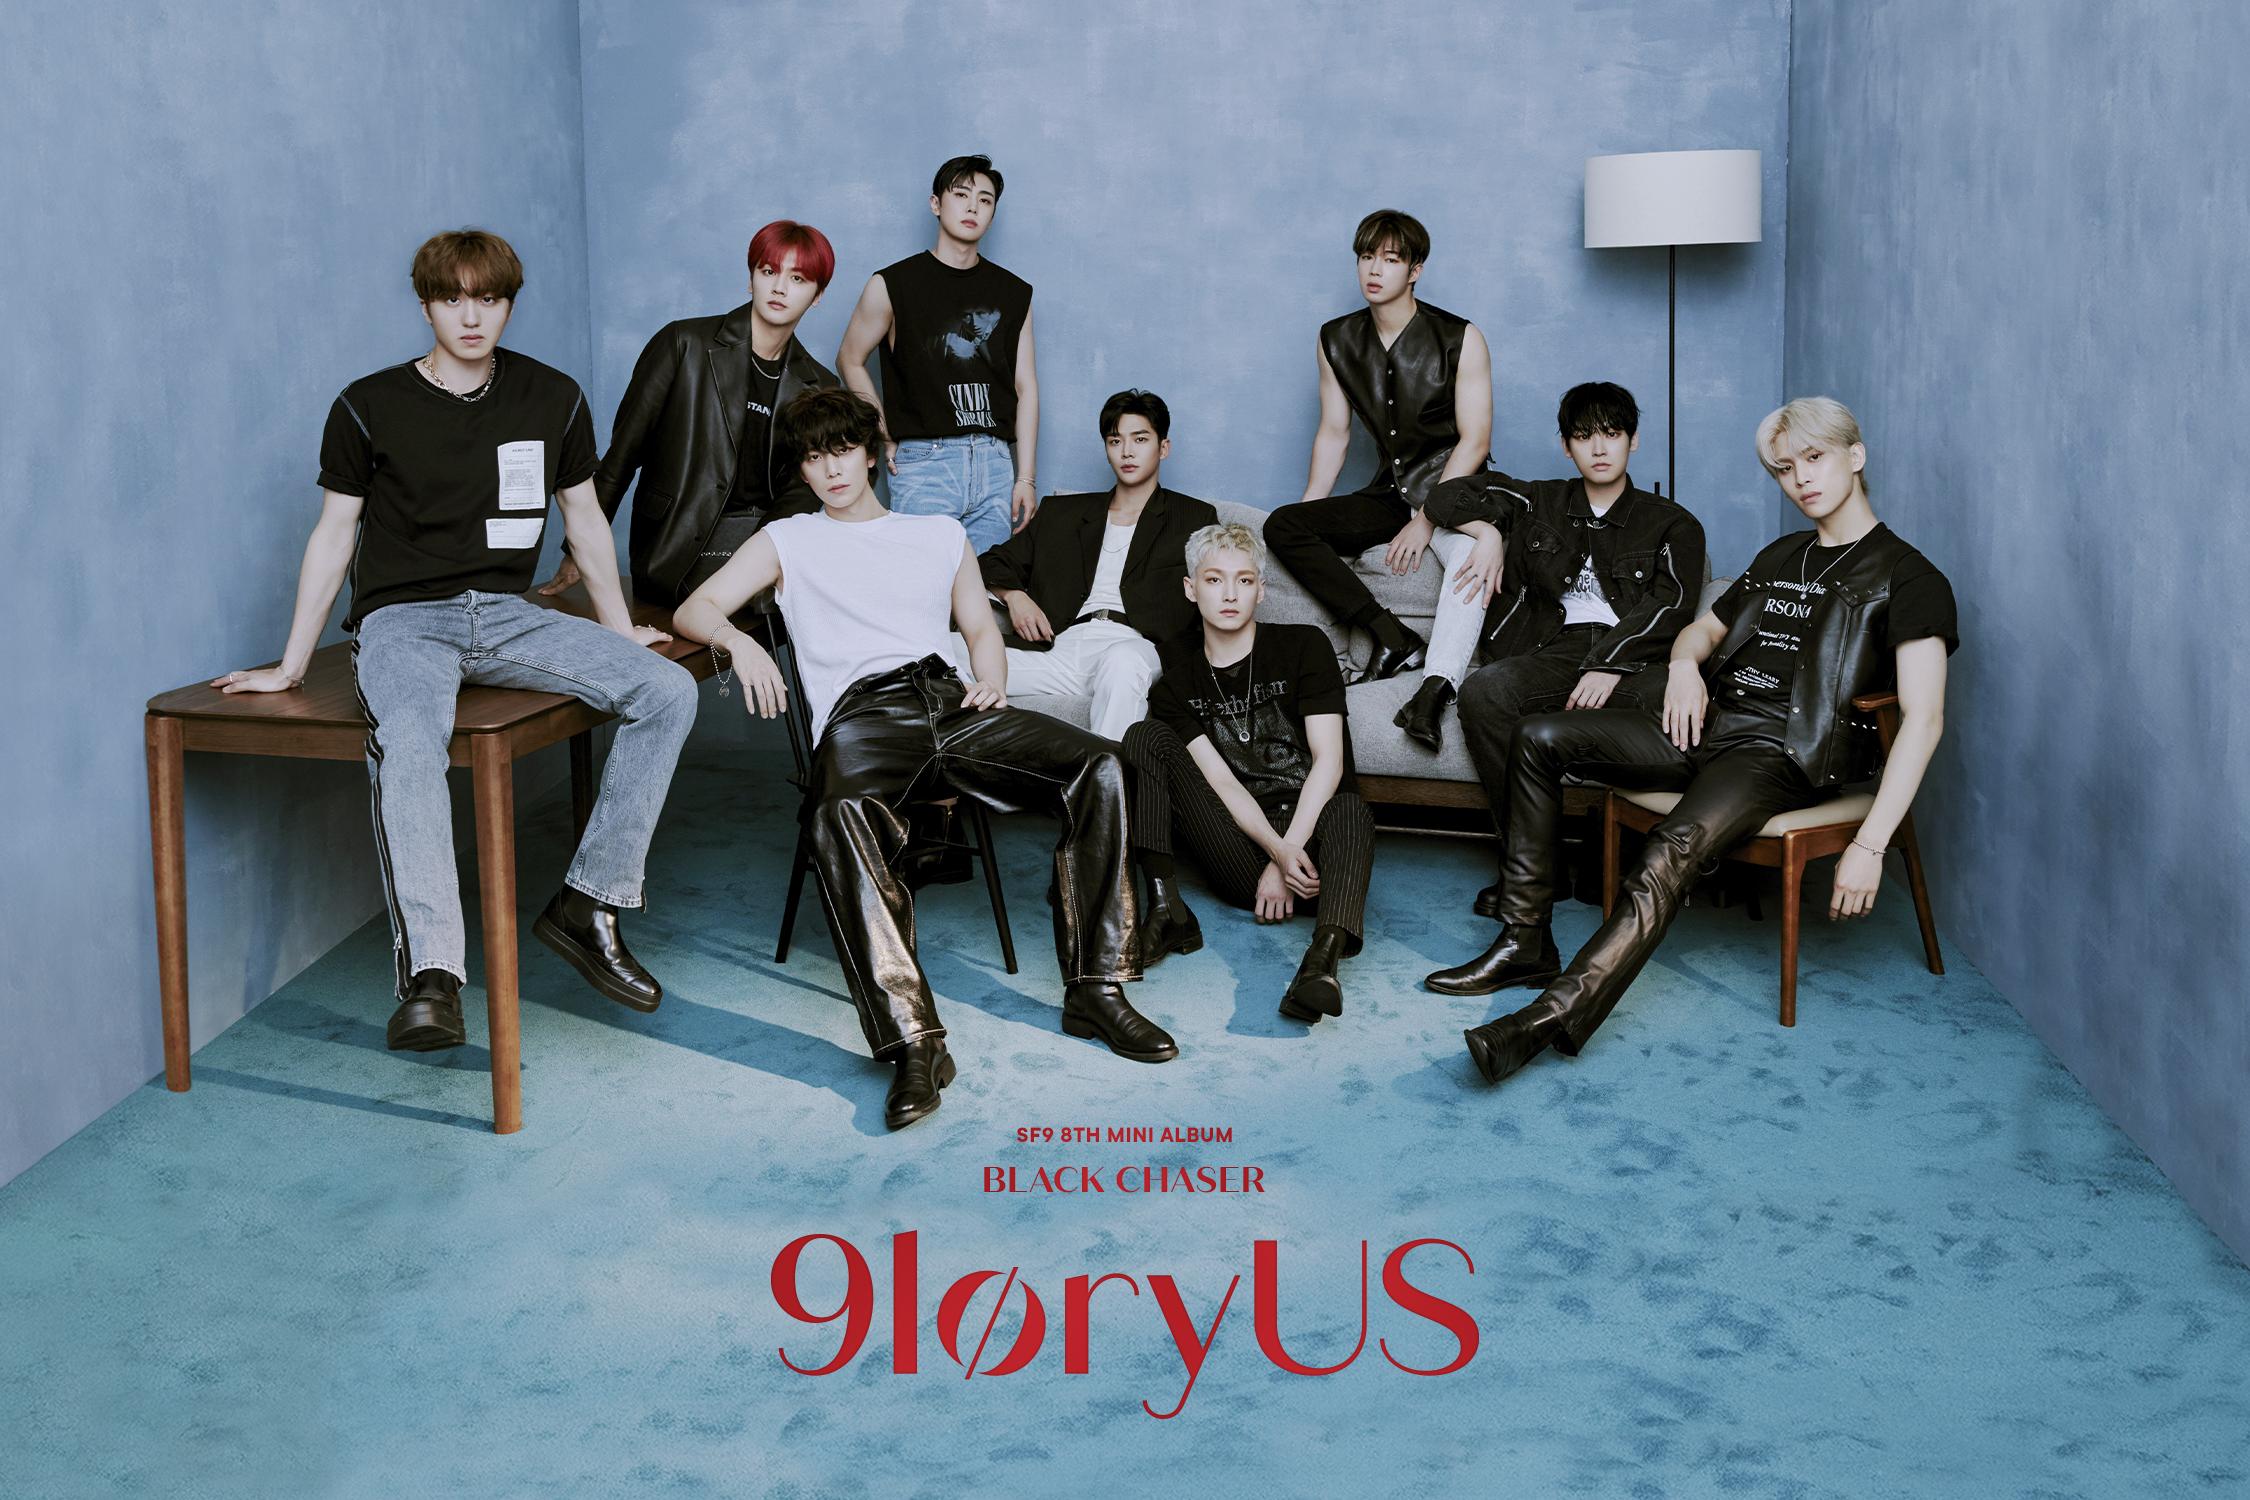 SF9 - 8th Mini Album 9loryUS group concept photo (Photo Credit=FNC Entertainment)